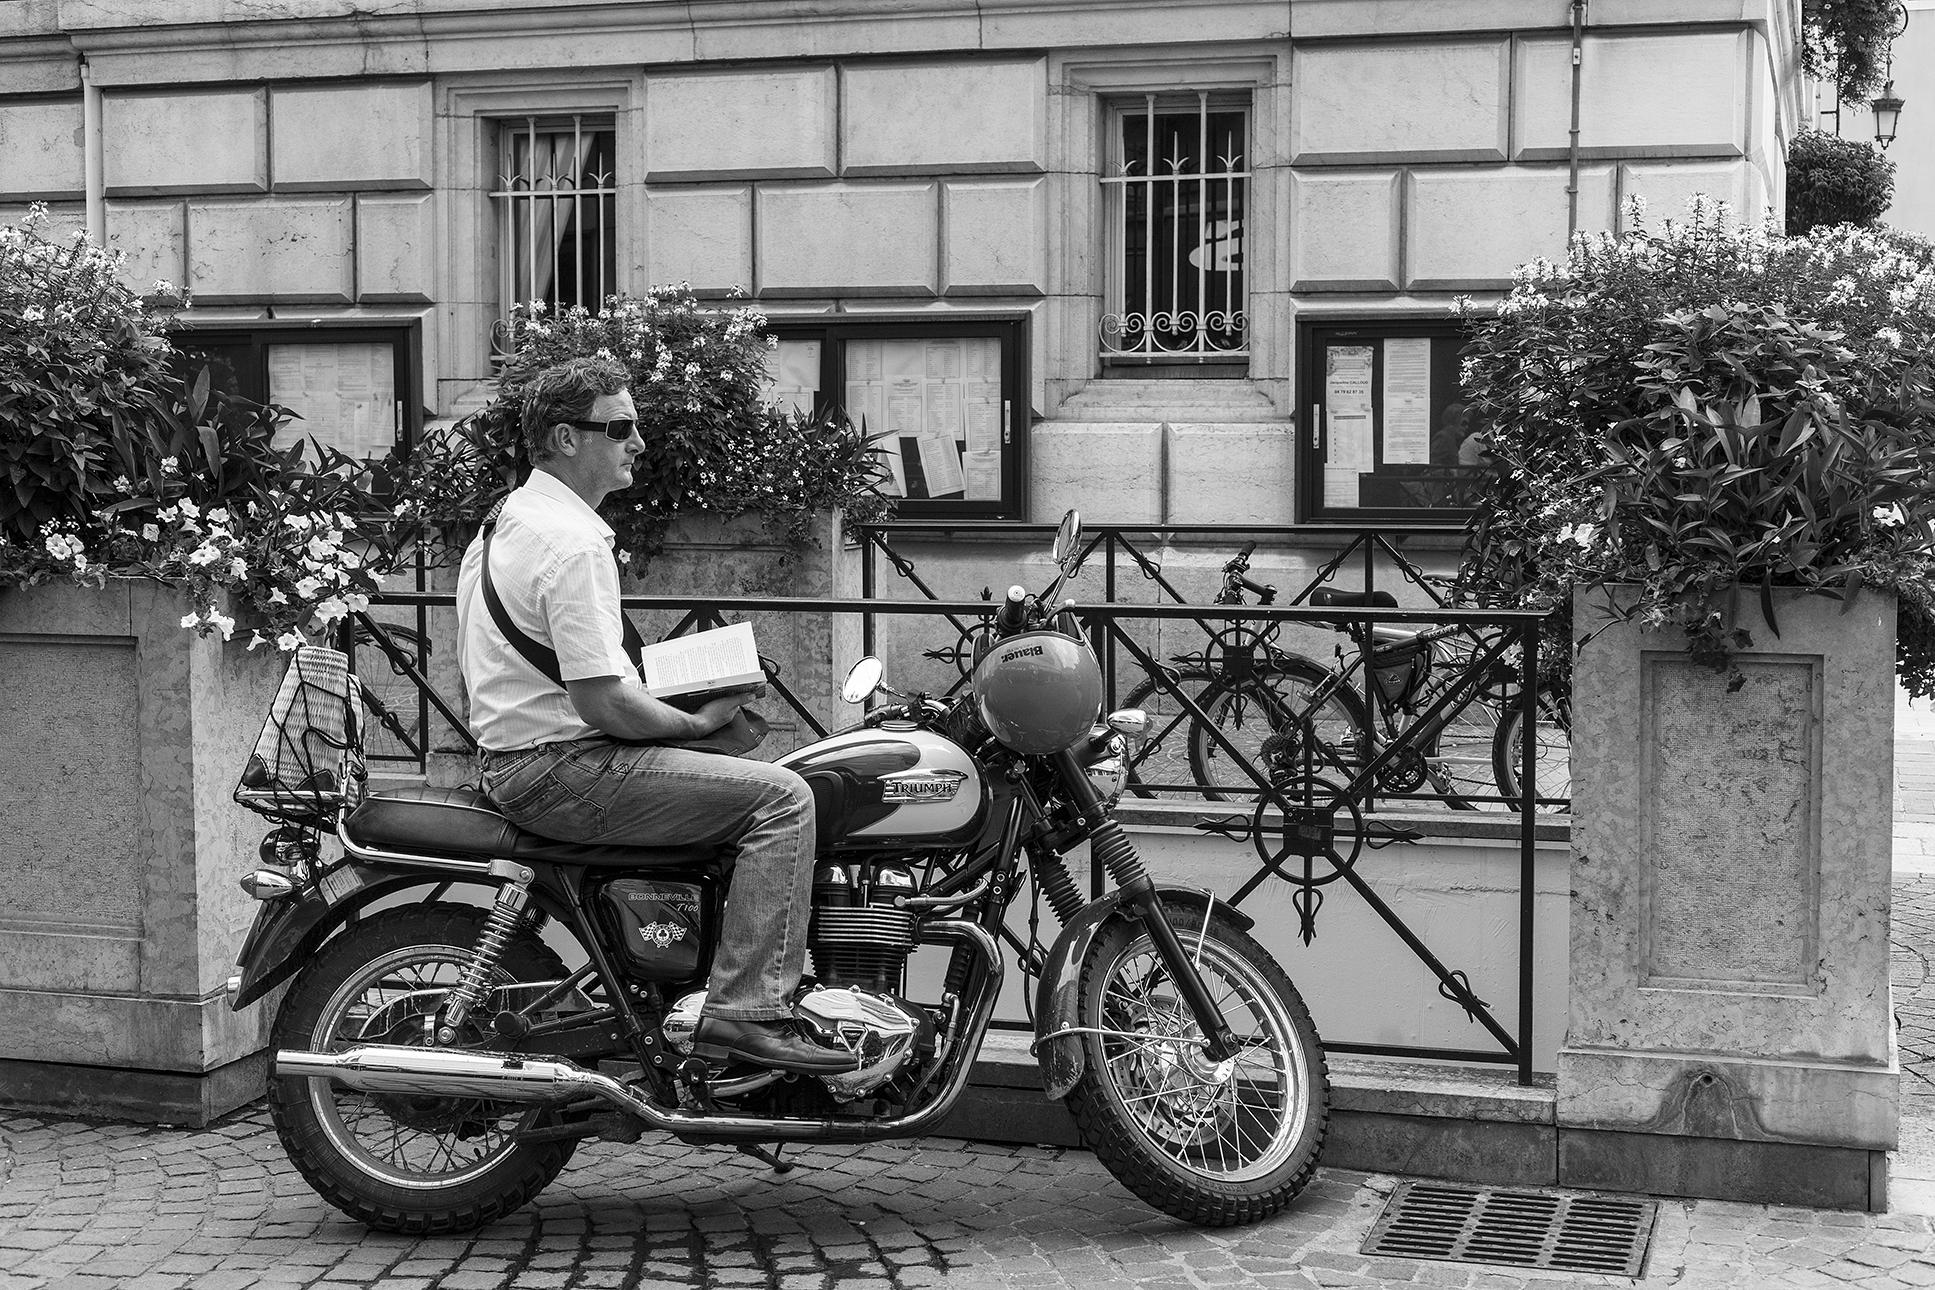 motard libraire-Chambery-aout-2012.jpg